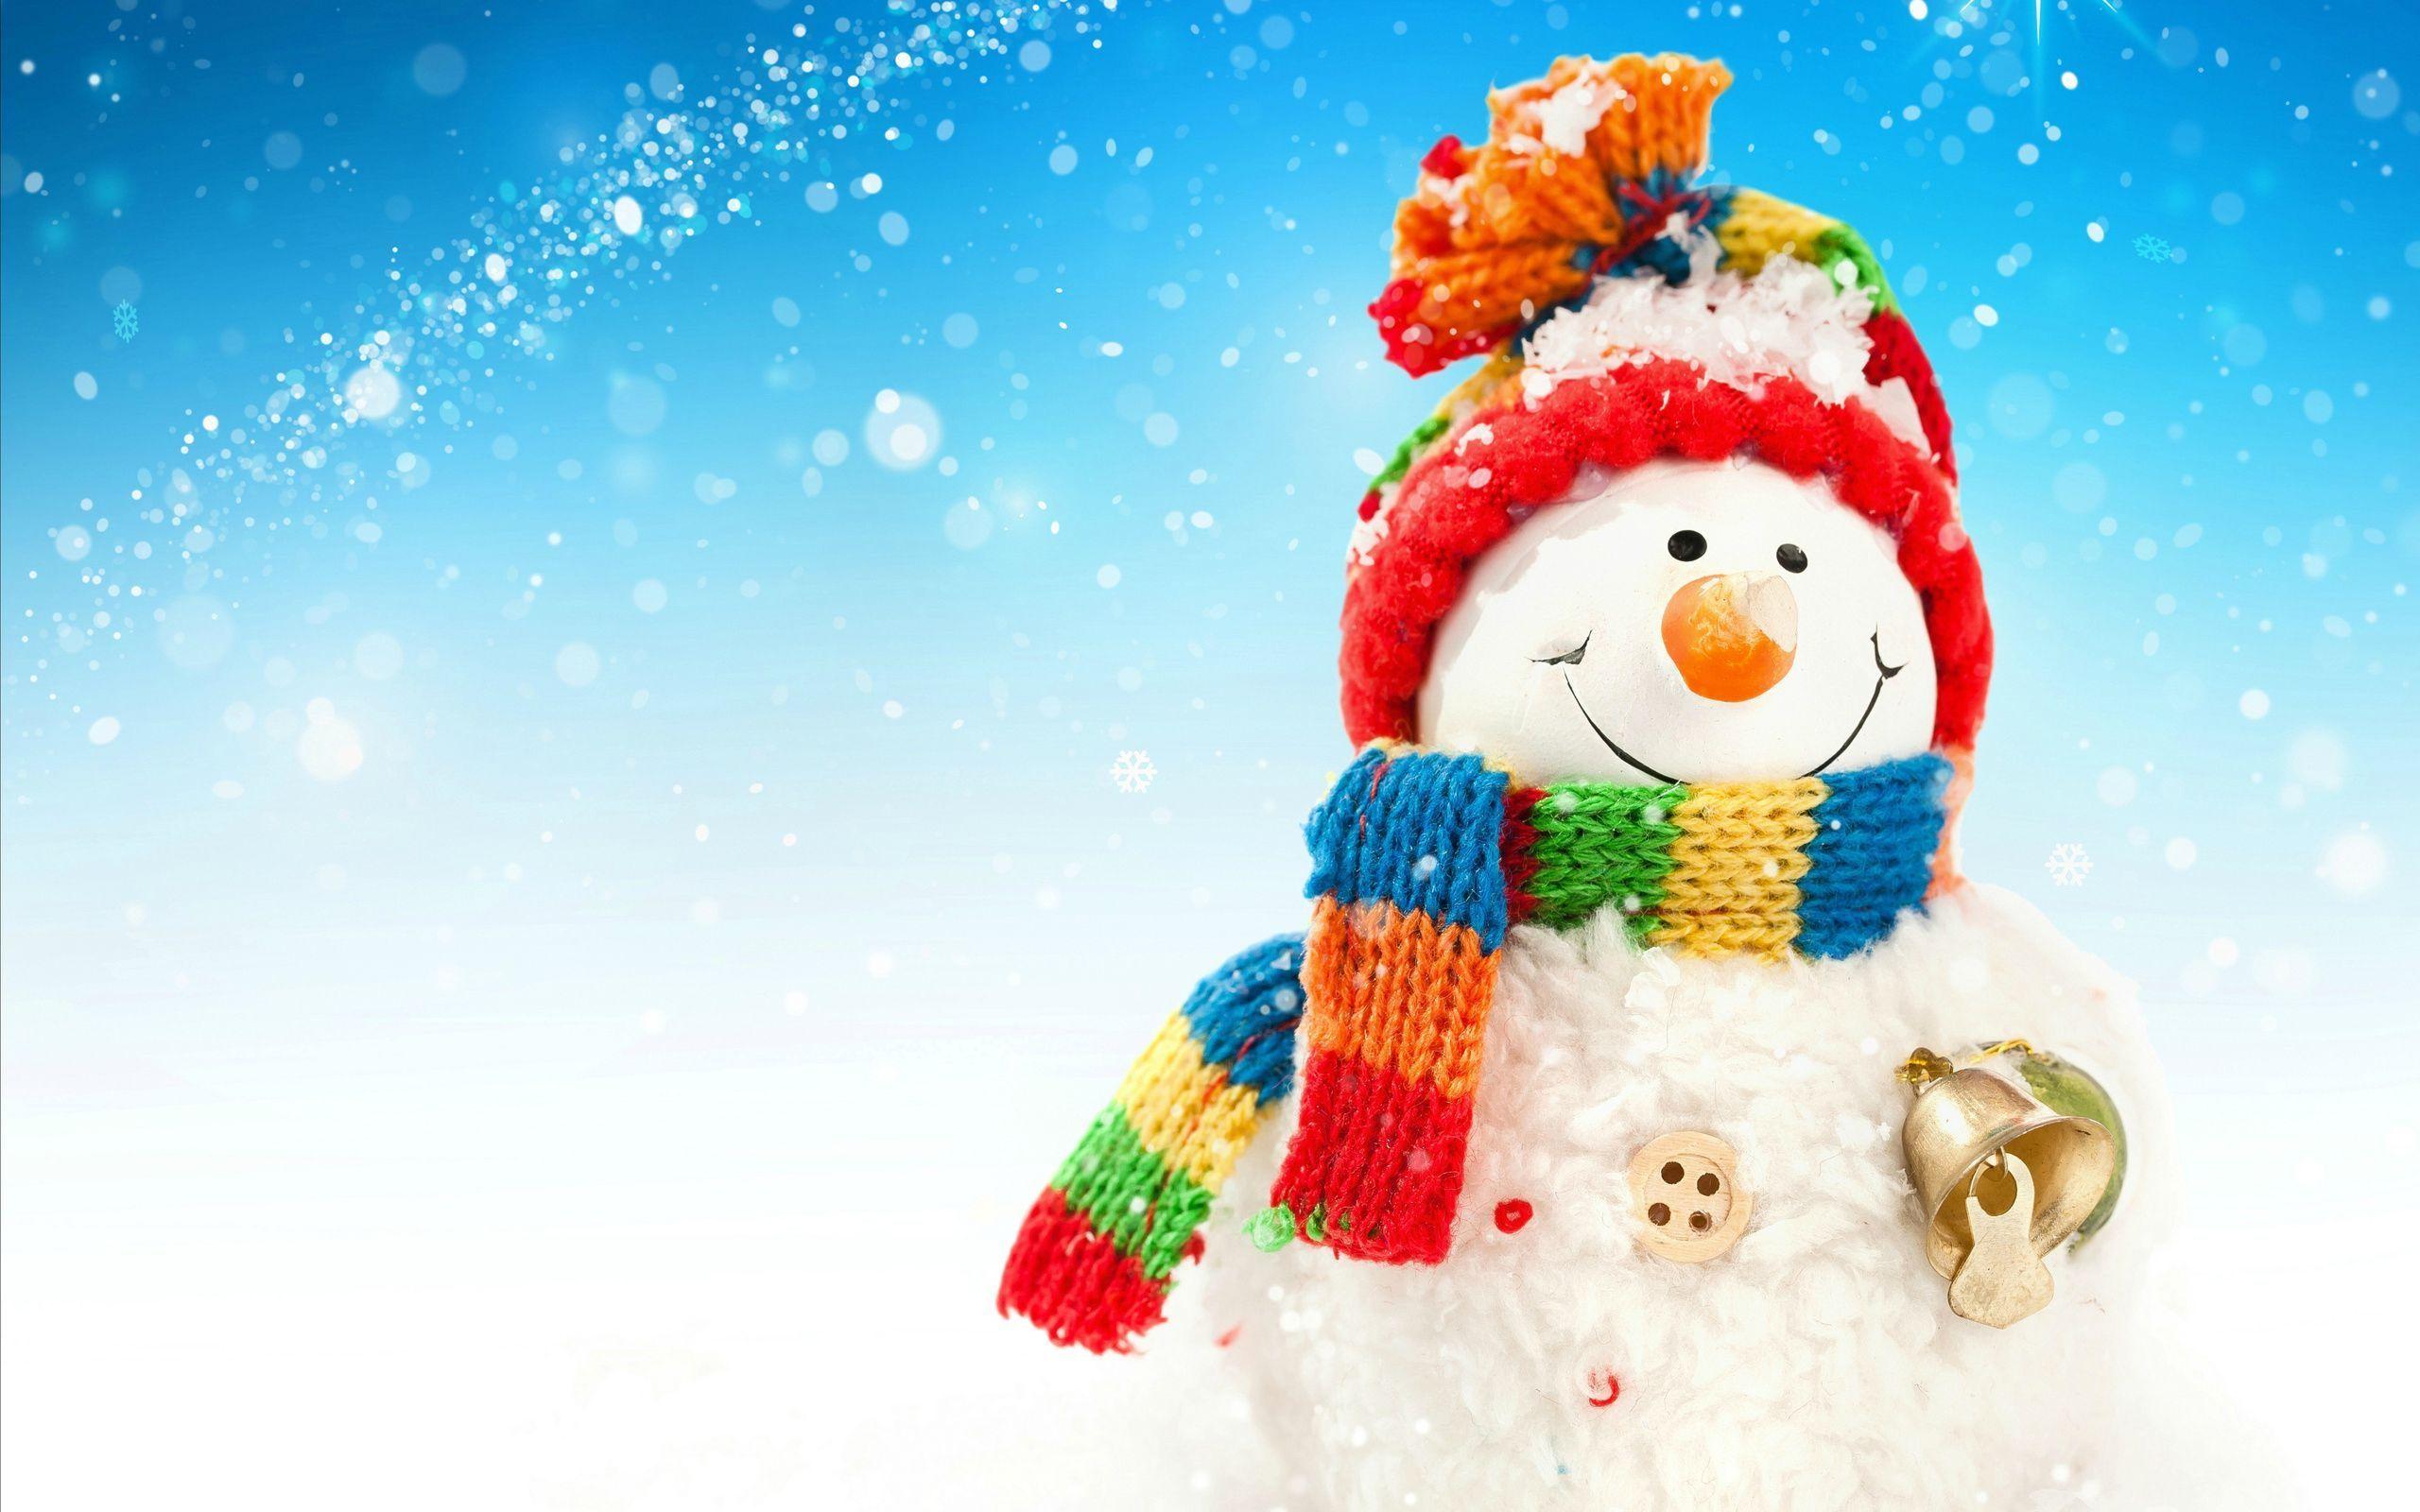 Funny Snowman Wallpaper Wallpaper Free Download